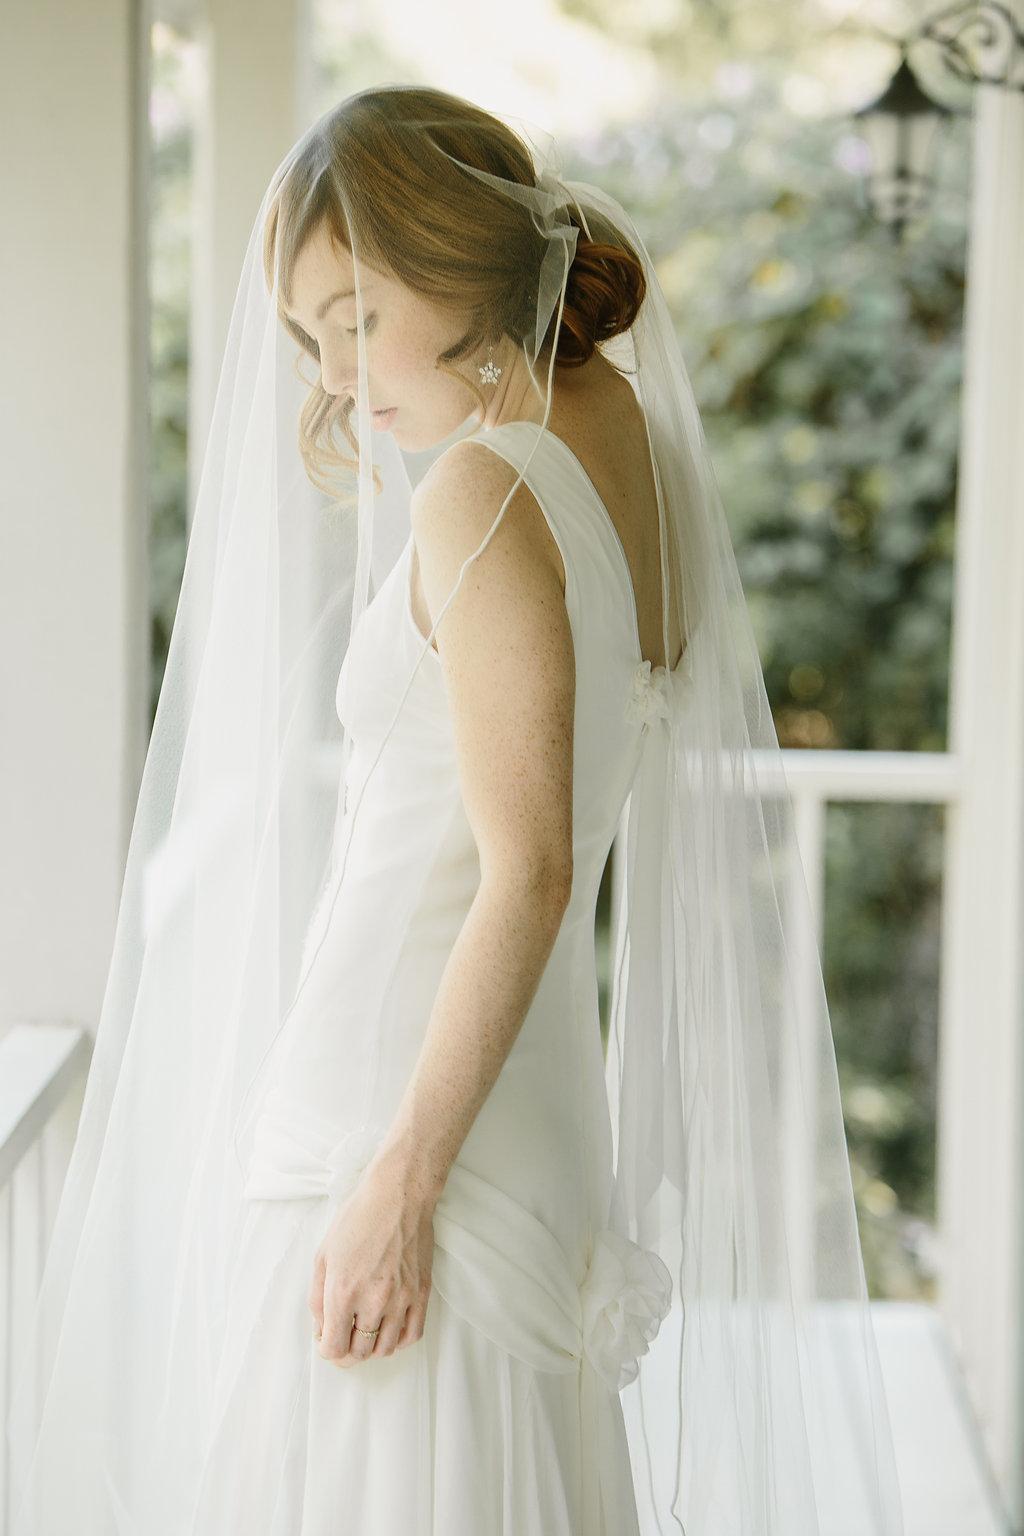 Bridal Veil Long Veil Panel Veil Butterfly Veil Satin